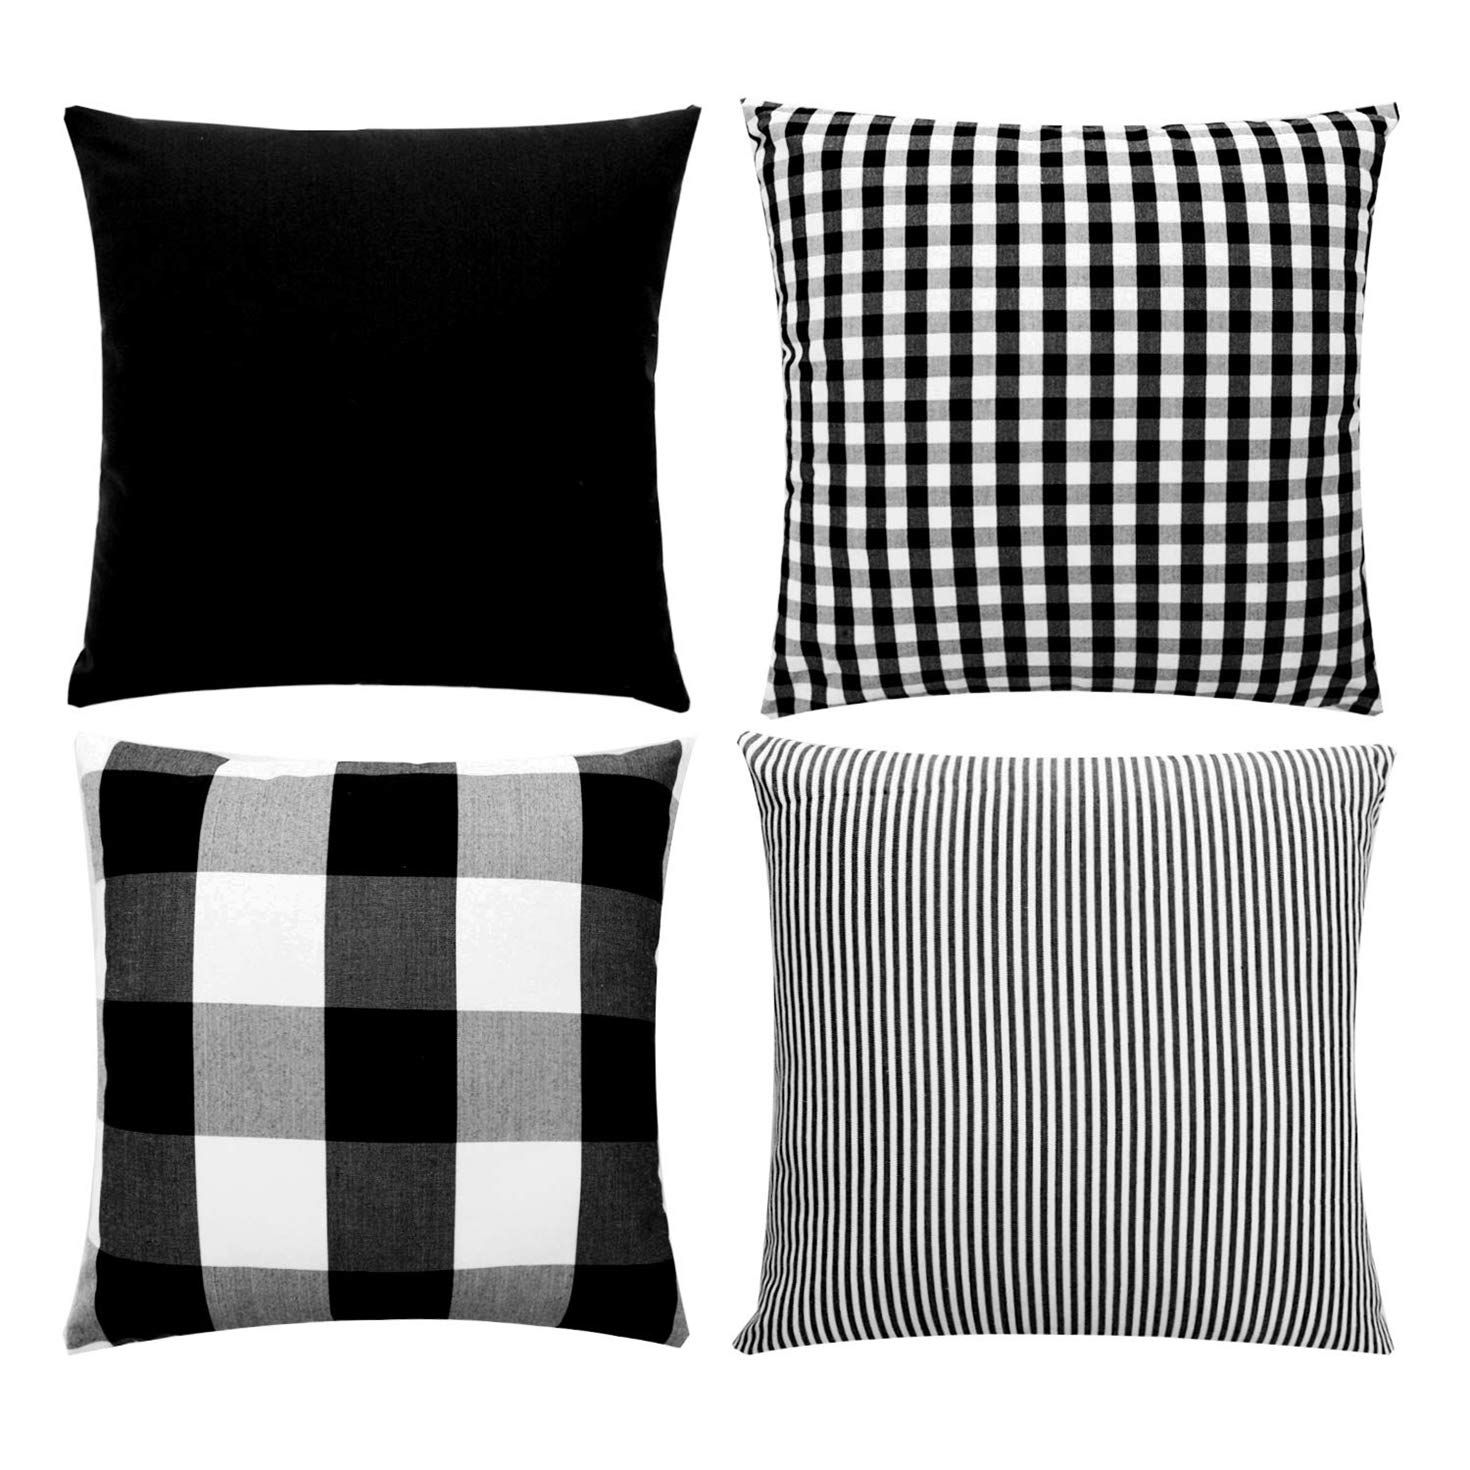 Home In 2020 Buffalo Check Plaid Black And White Decor Buffalo Plaid Pillows